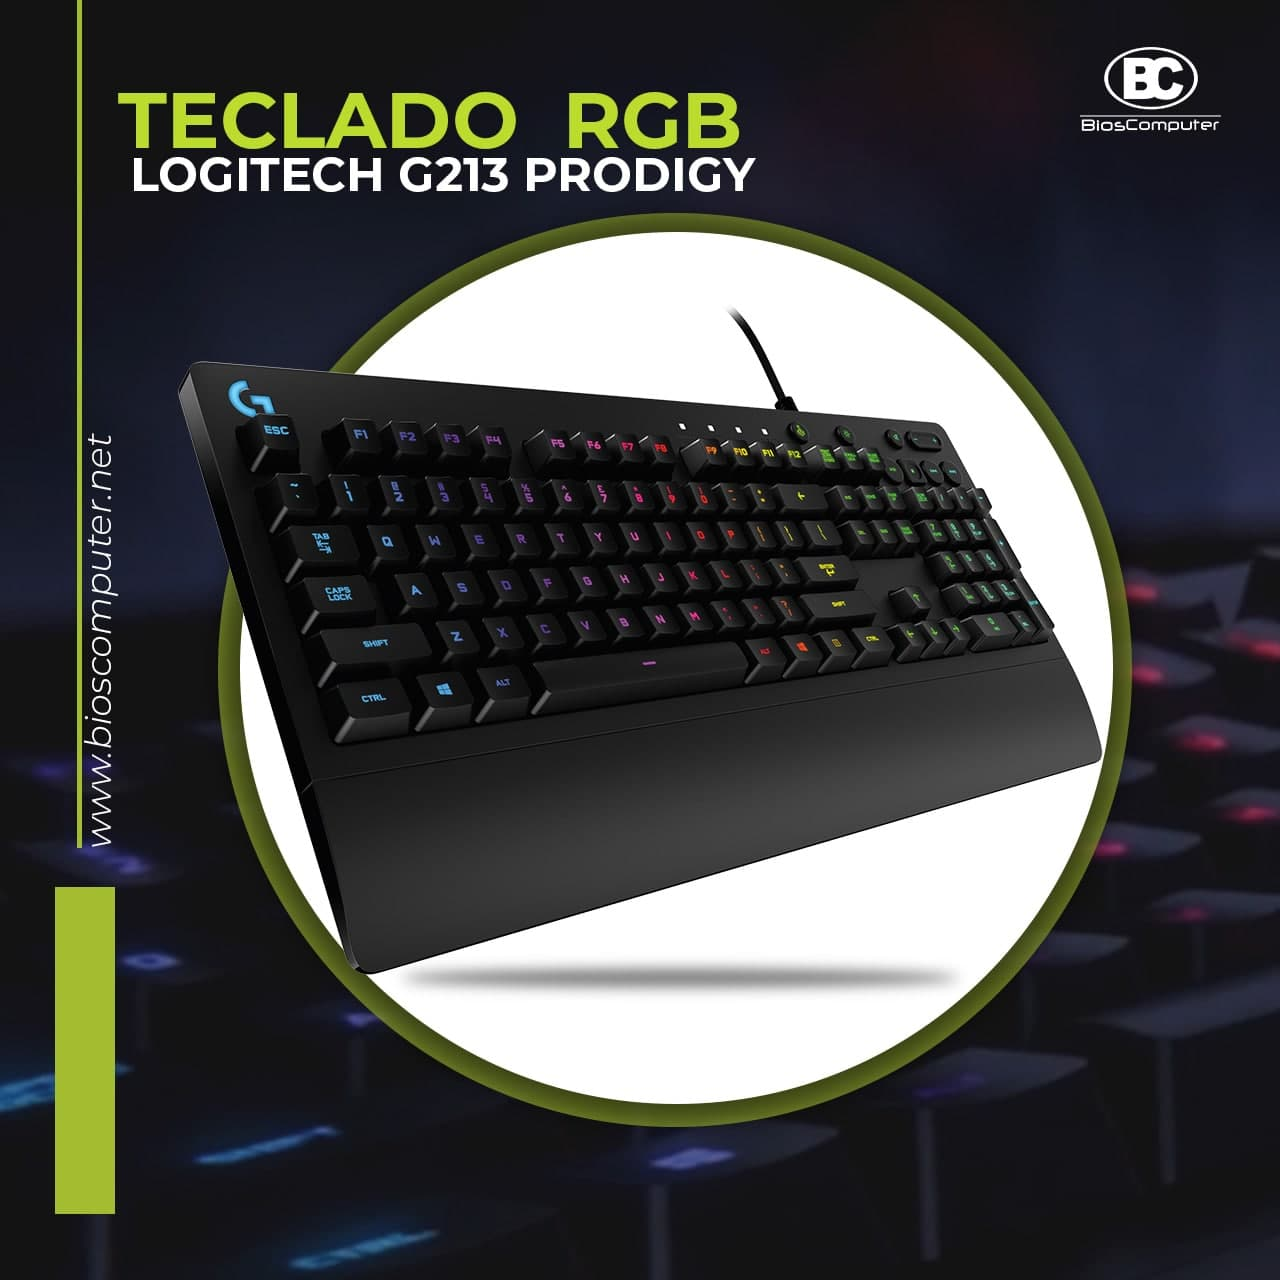 Teclado RGB Logitech G213